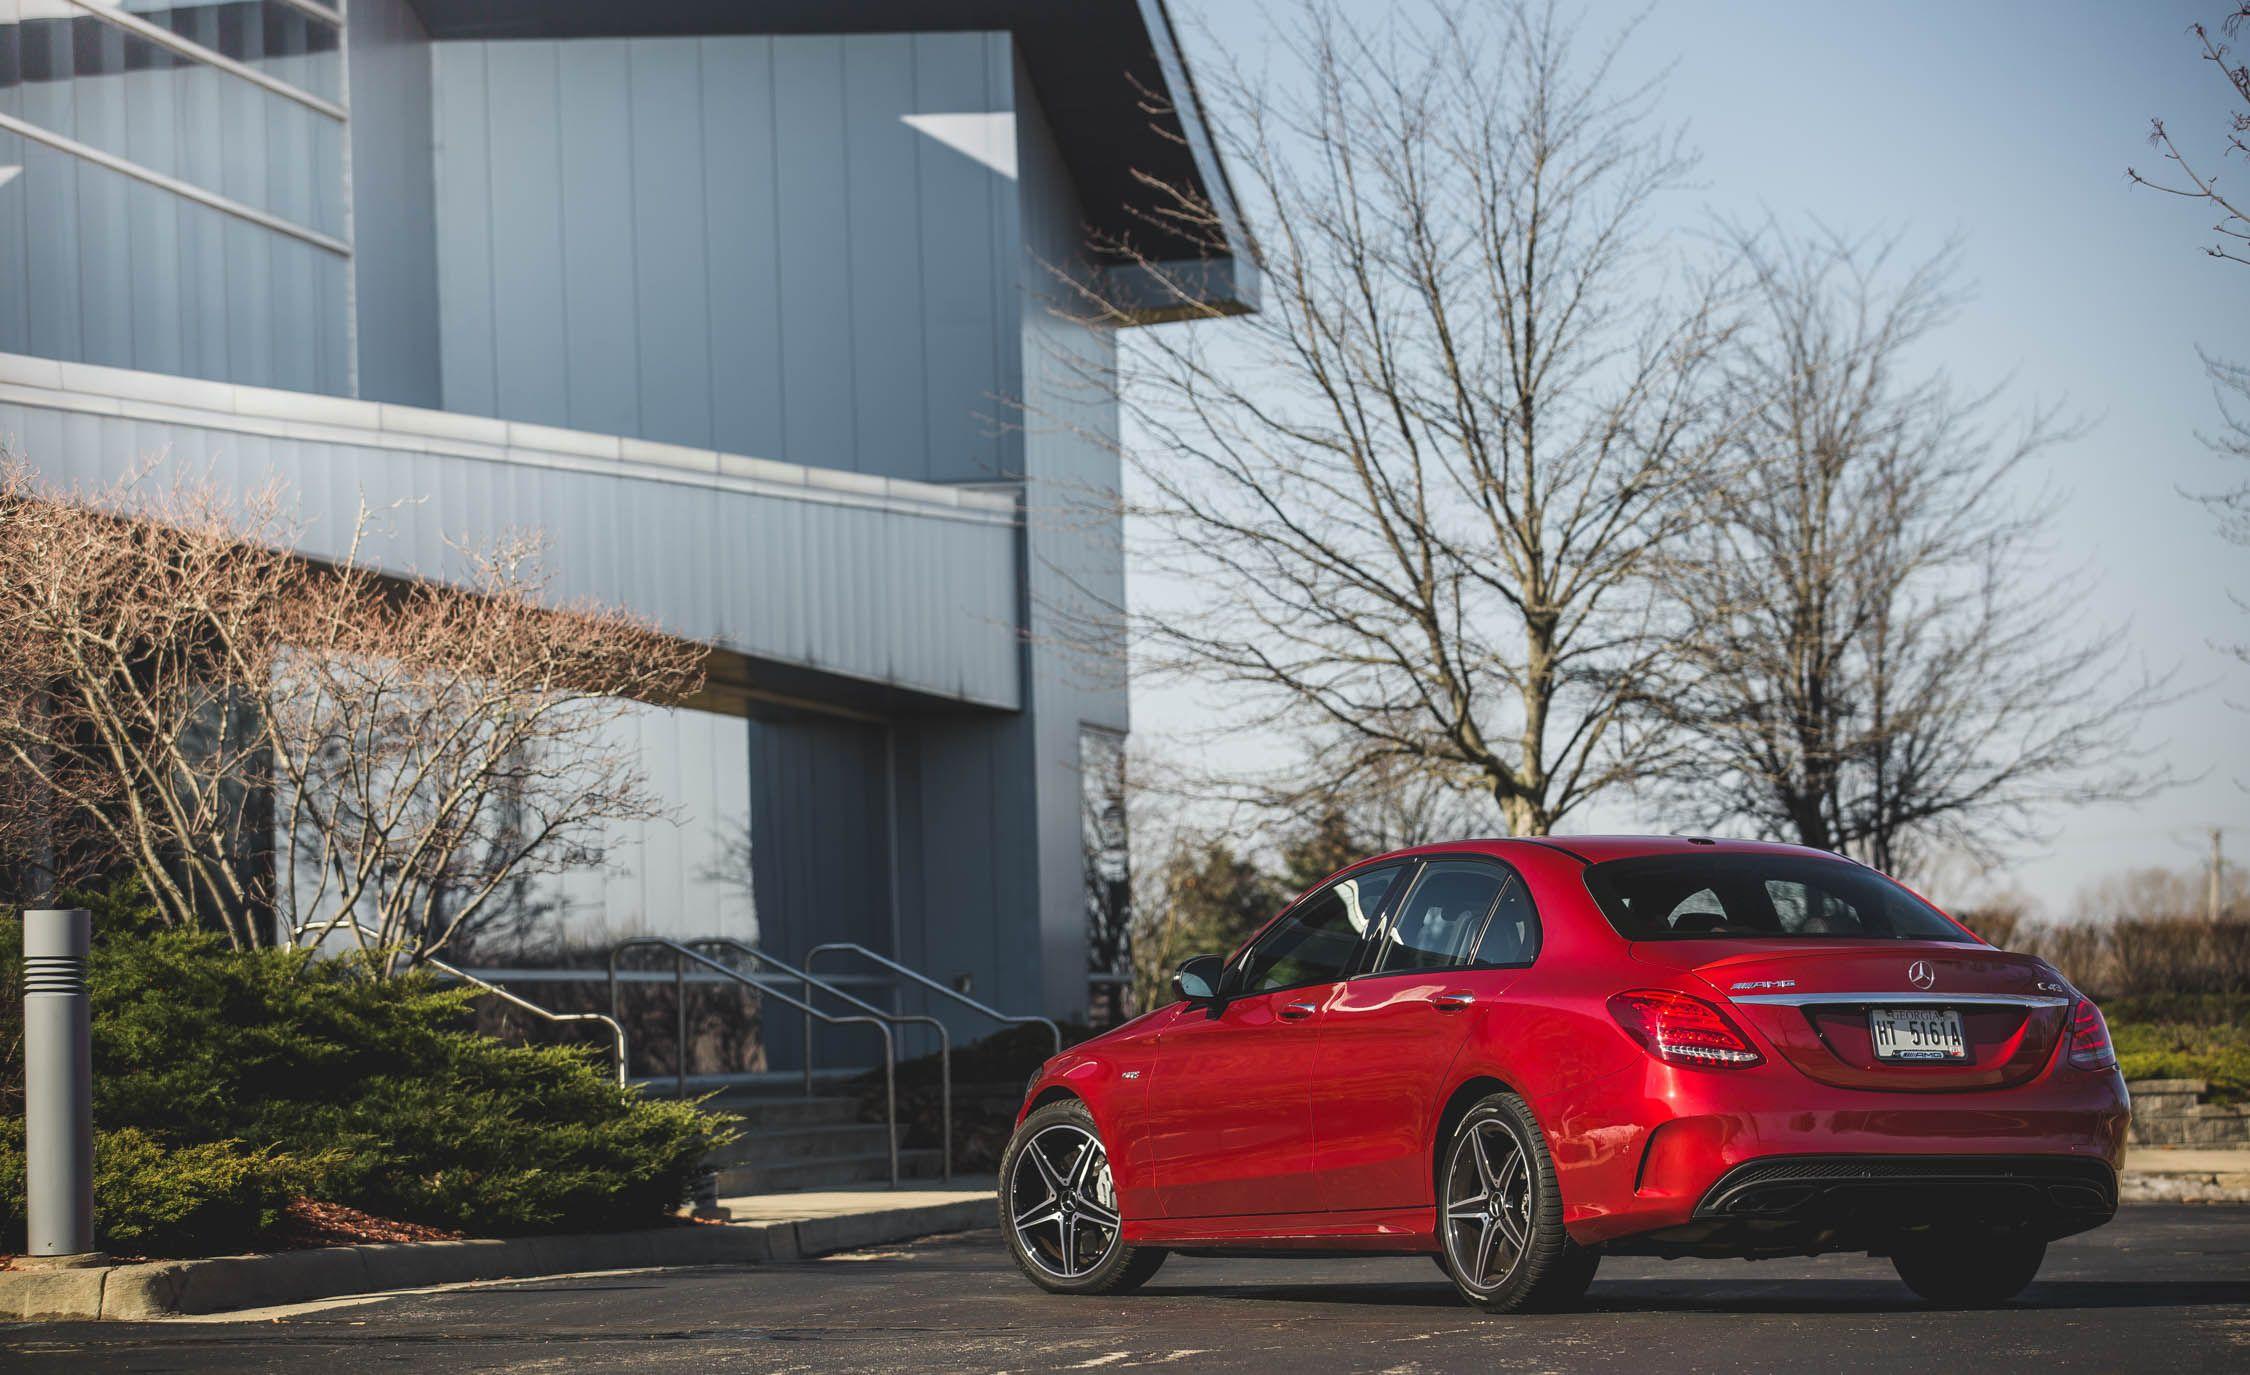 Mercedes Amg C43 Reviews Price Photos And Specs 3 0 Engine Diagram Car Driver